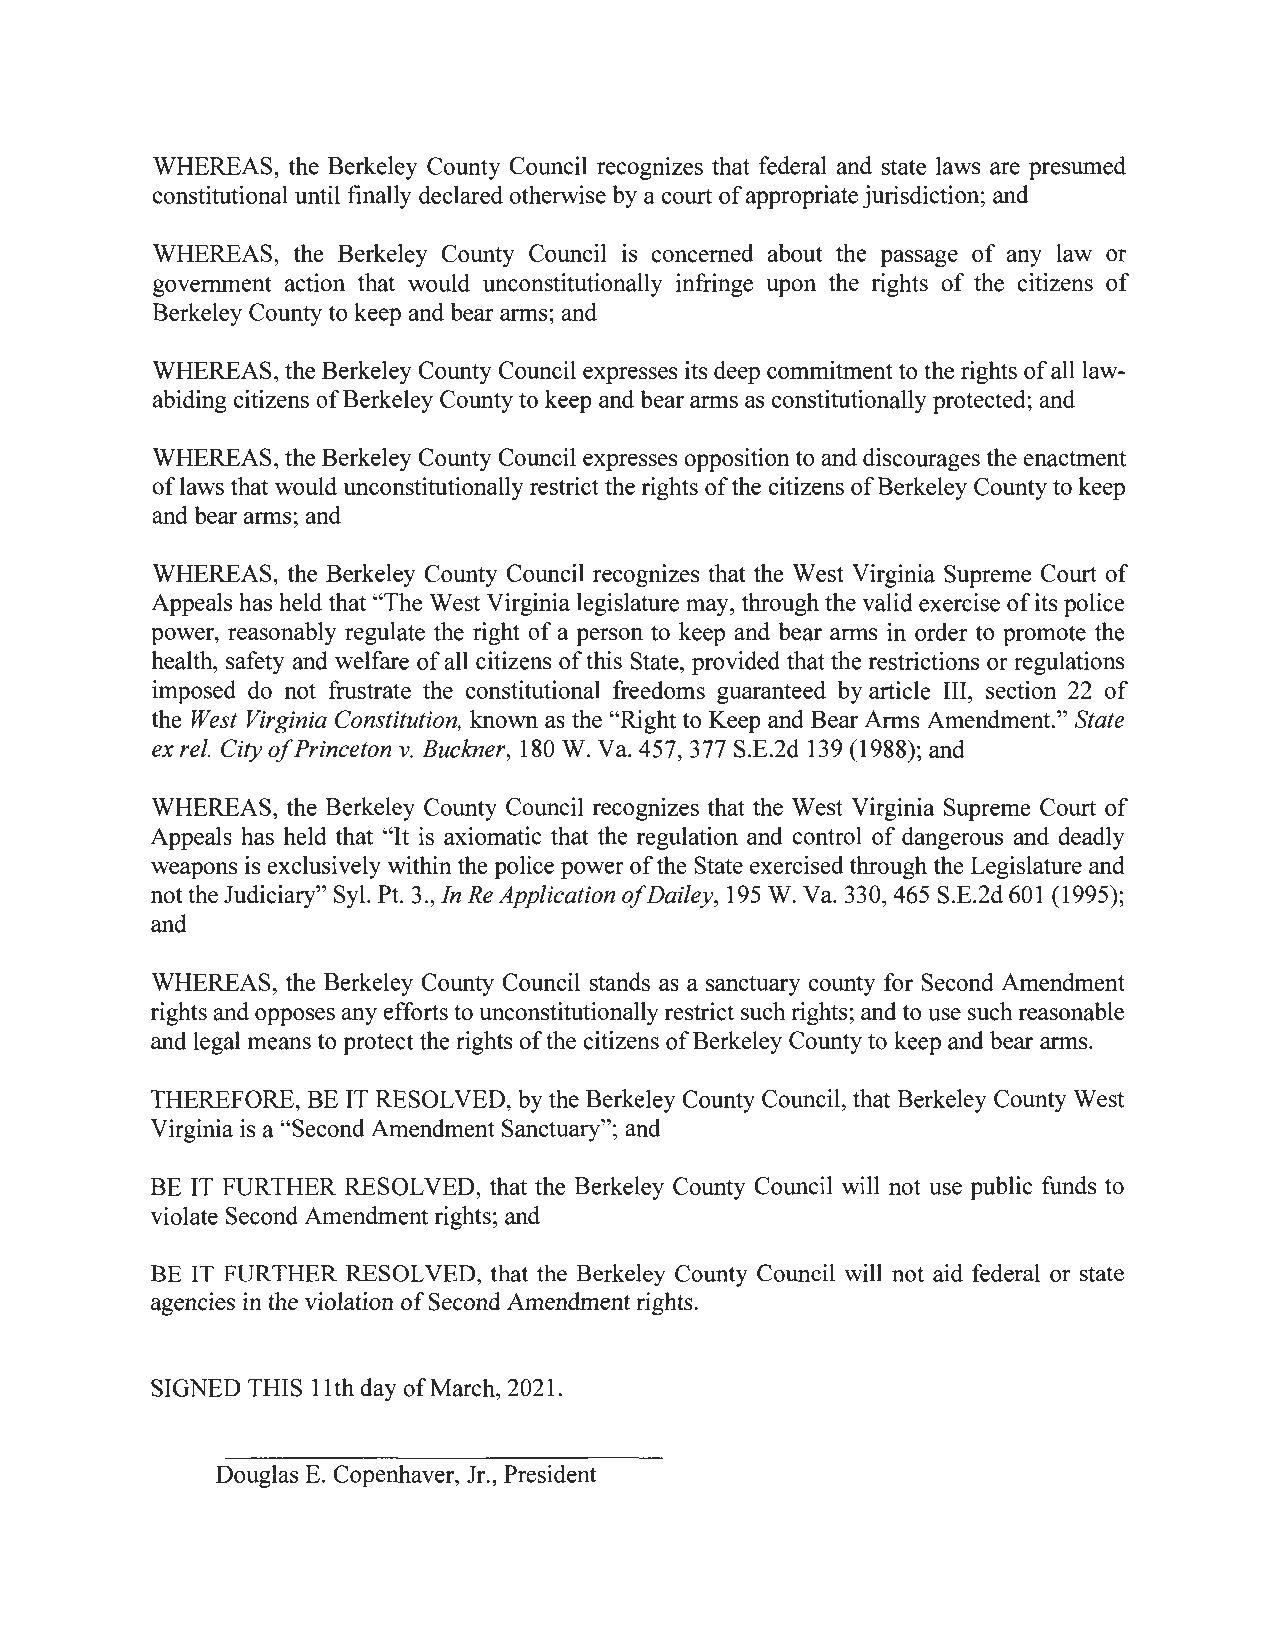 Berkley County West Virginia Second Amendment Sanctuary Resolution Page 2